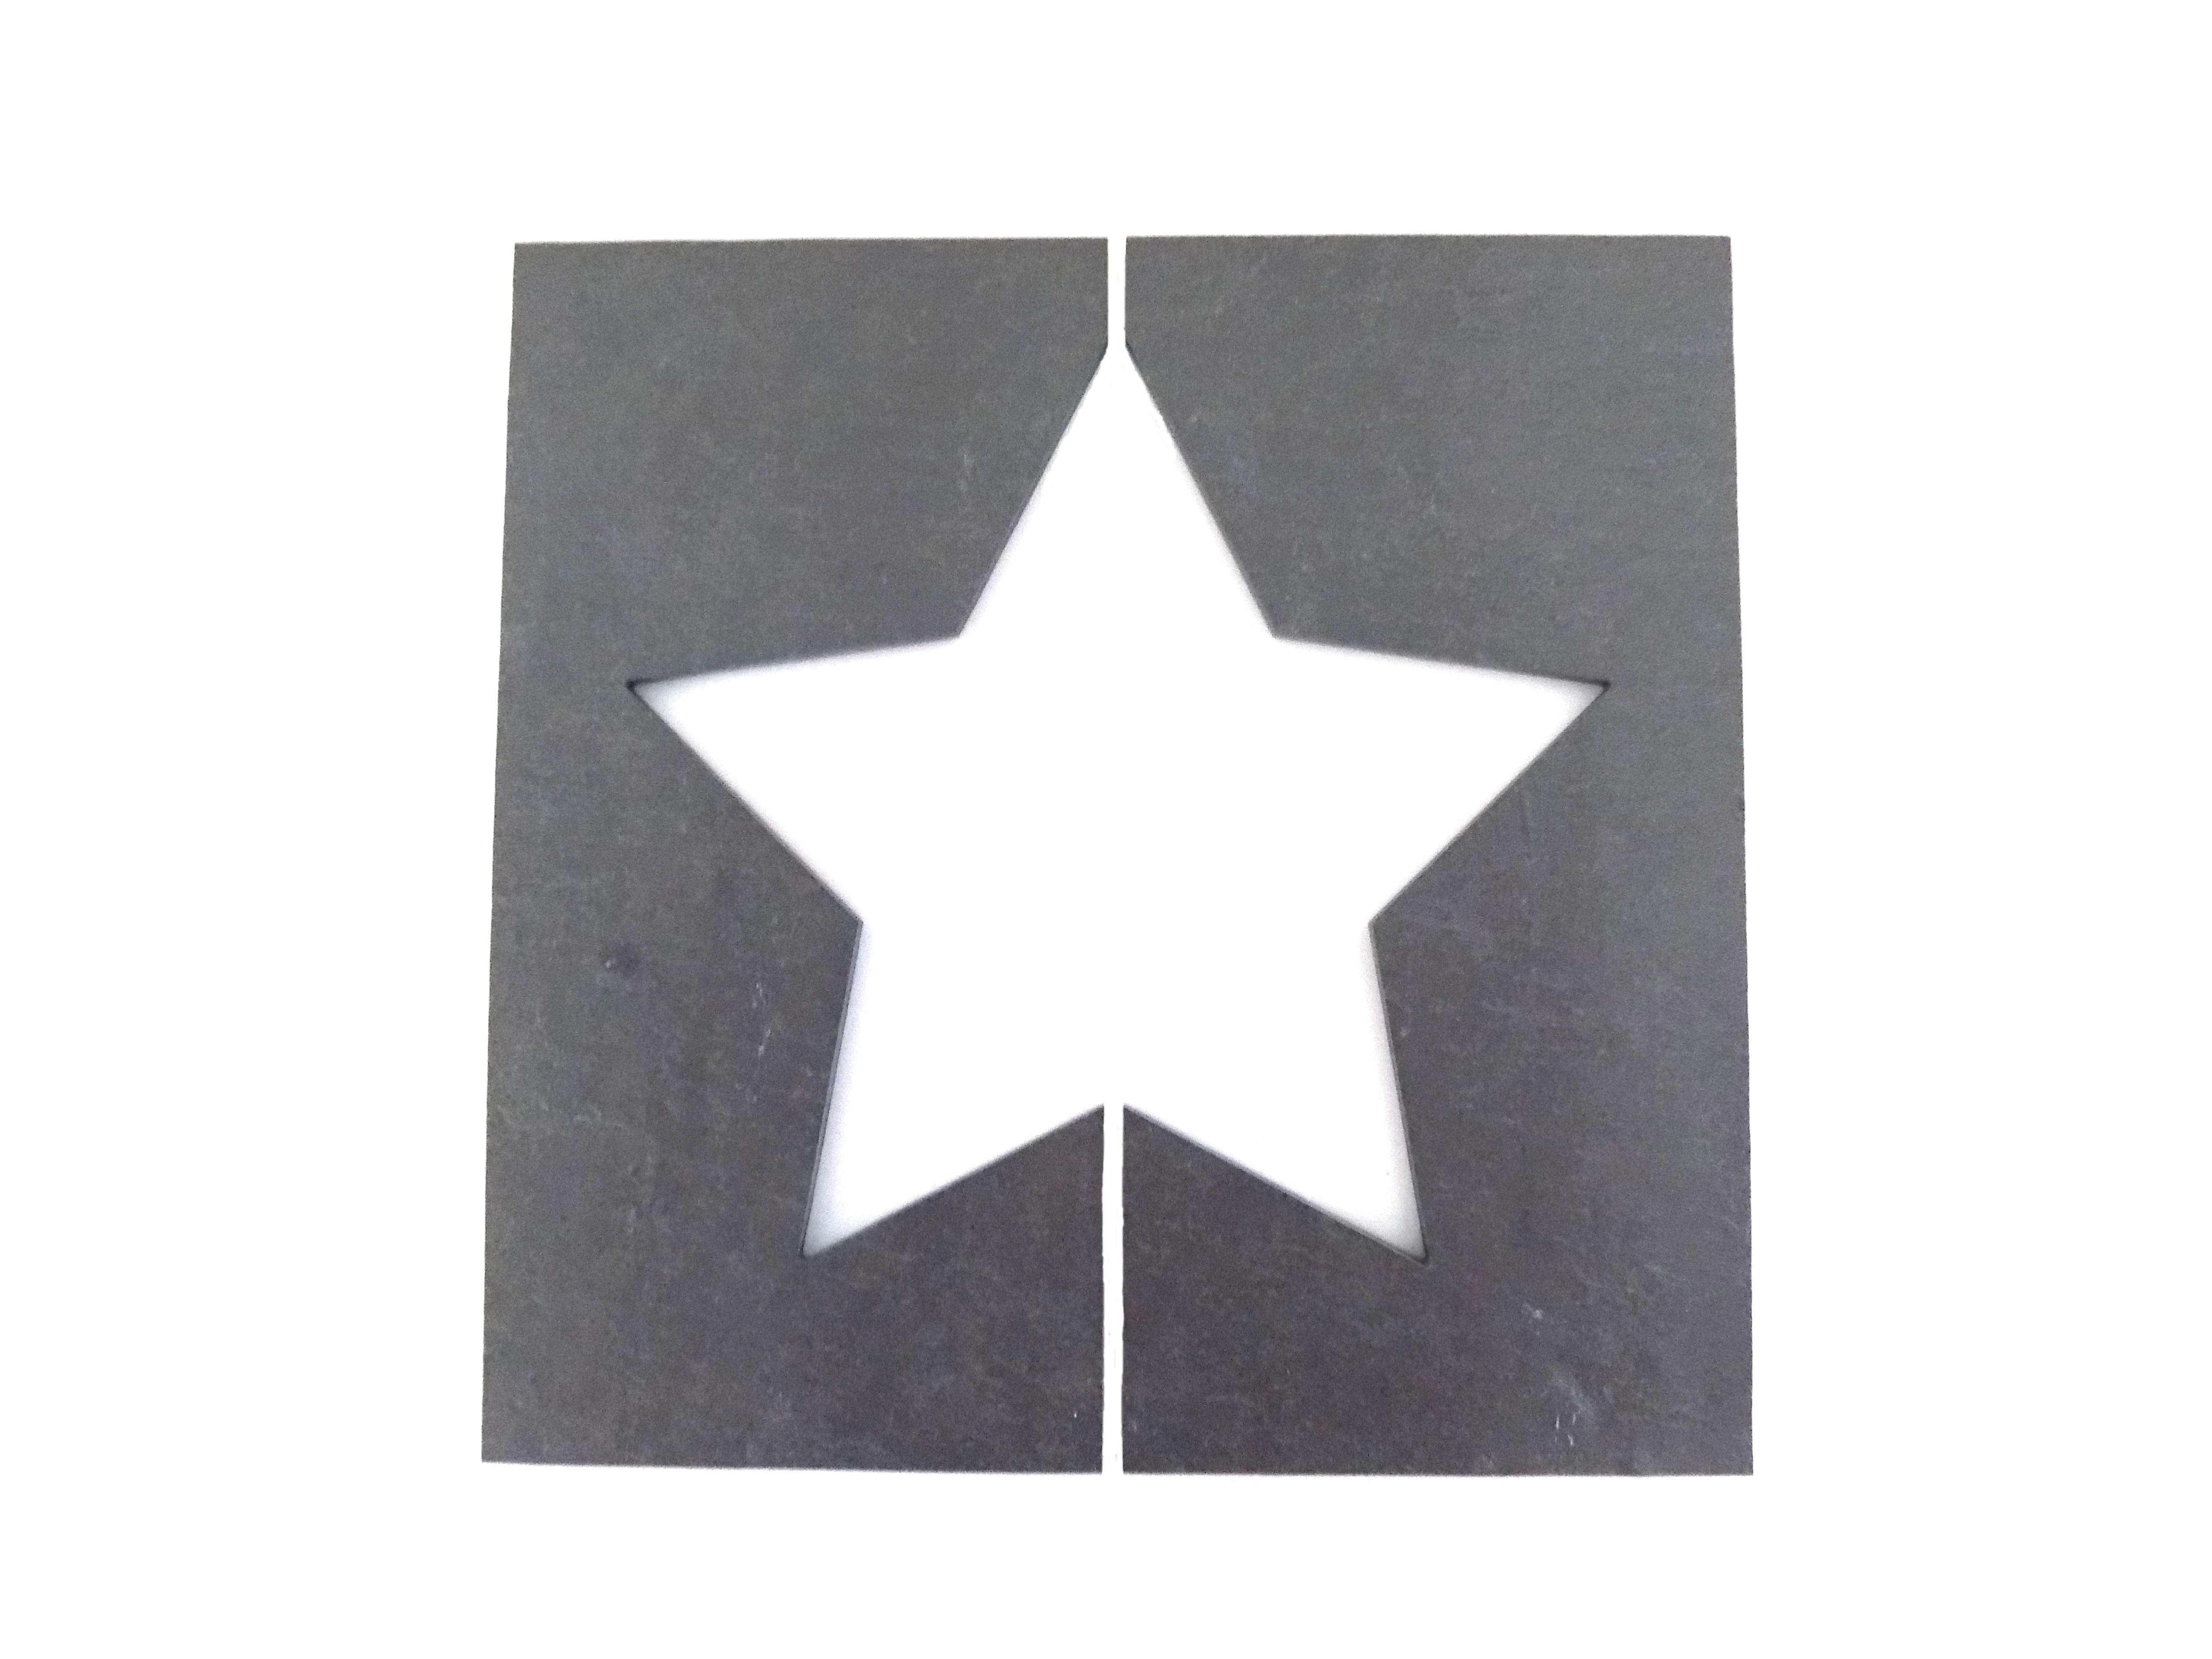 Primero Sterntafel ca. 20x20cm 2-tlg.